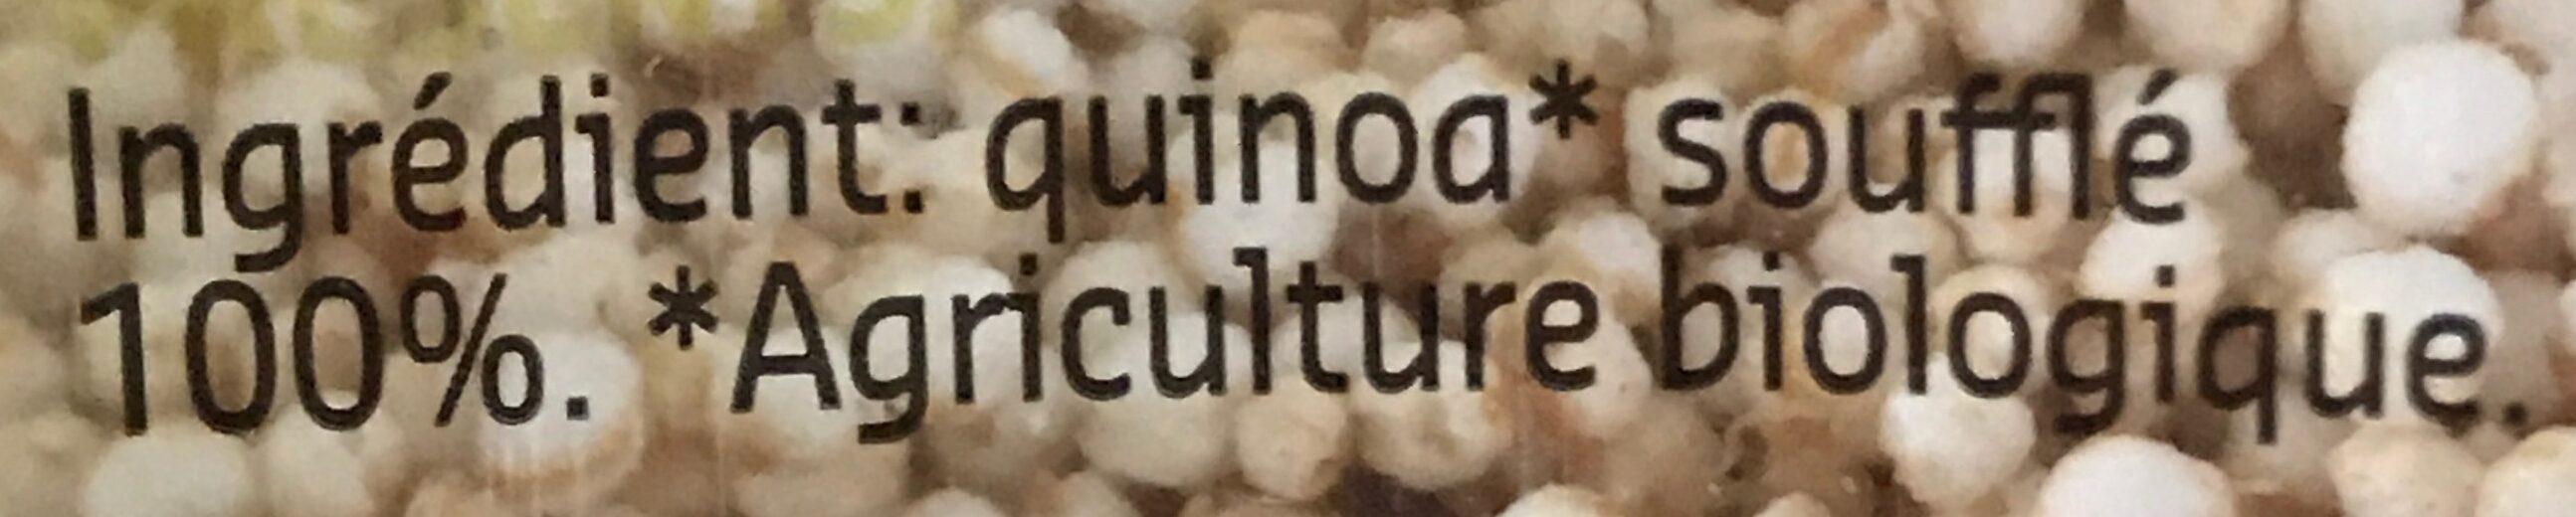 Quinoa soufflé - Ingredients - fr